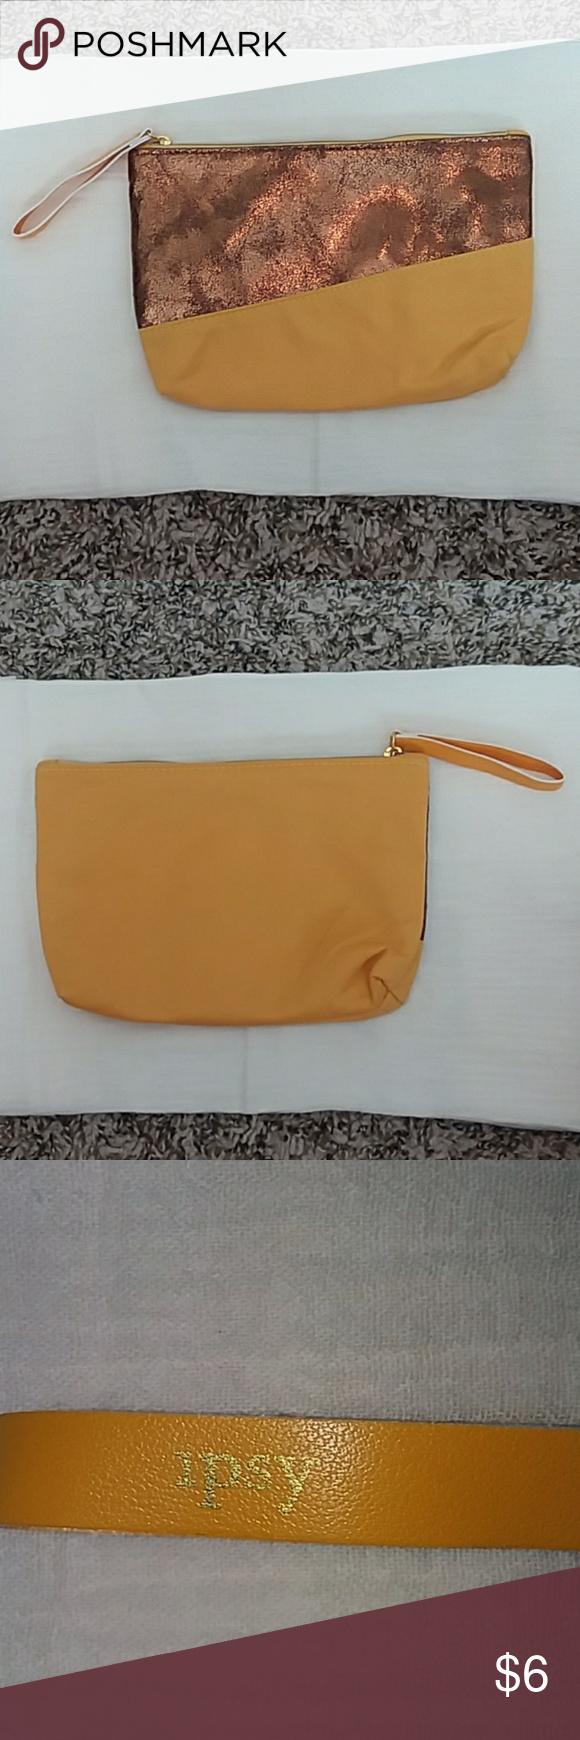 Ipsy makeup bag mustard yellow and bronze Ipsy makeup